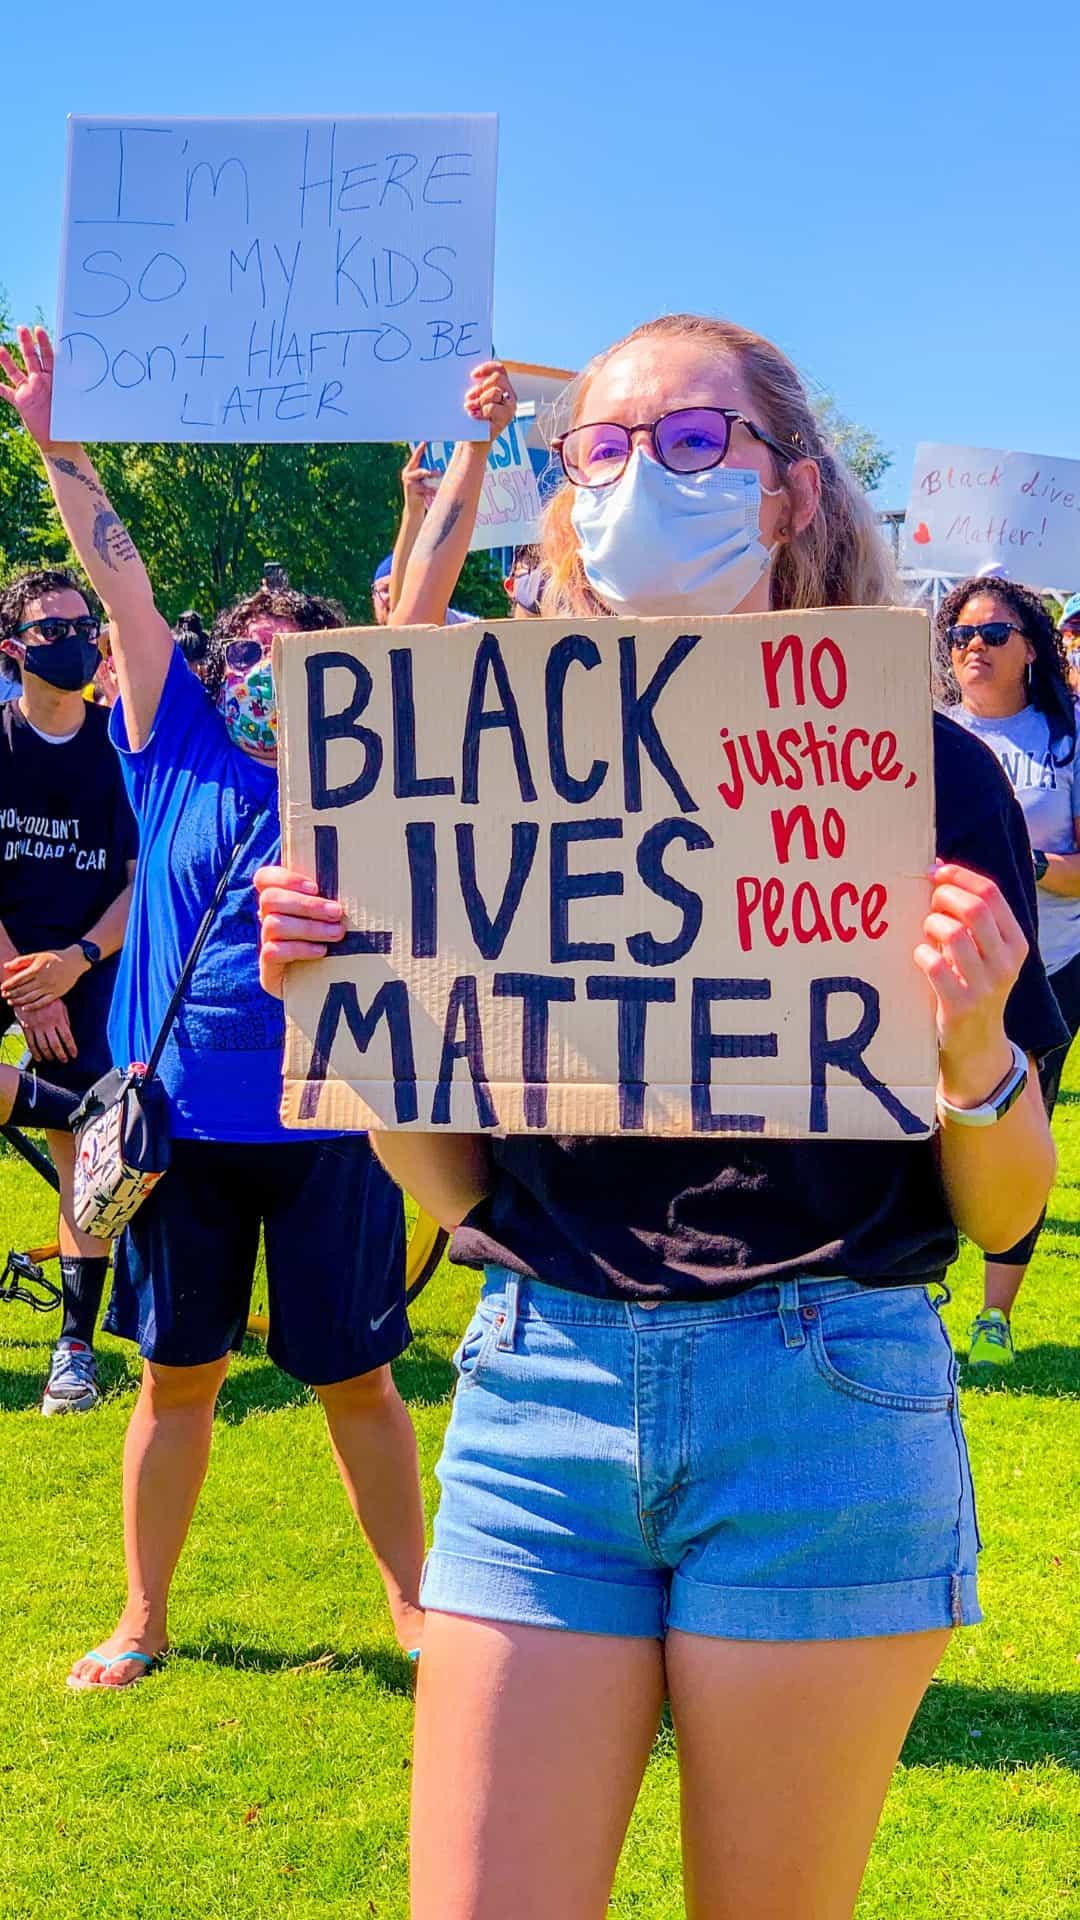 Protest sign no justice no peace - Black lives matter